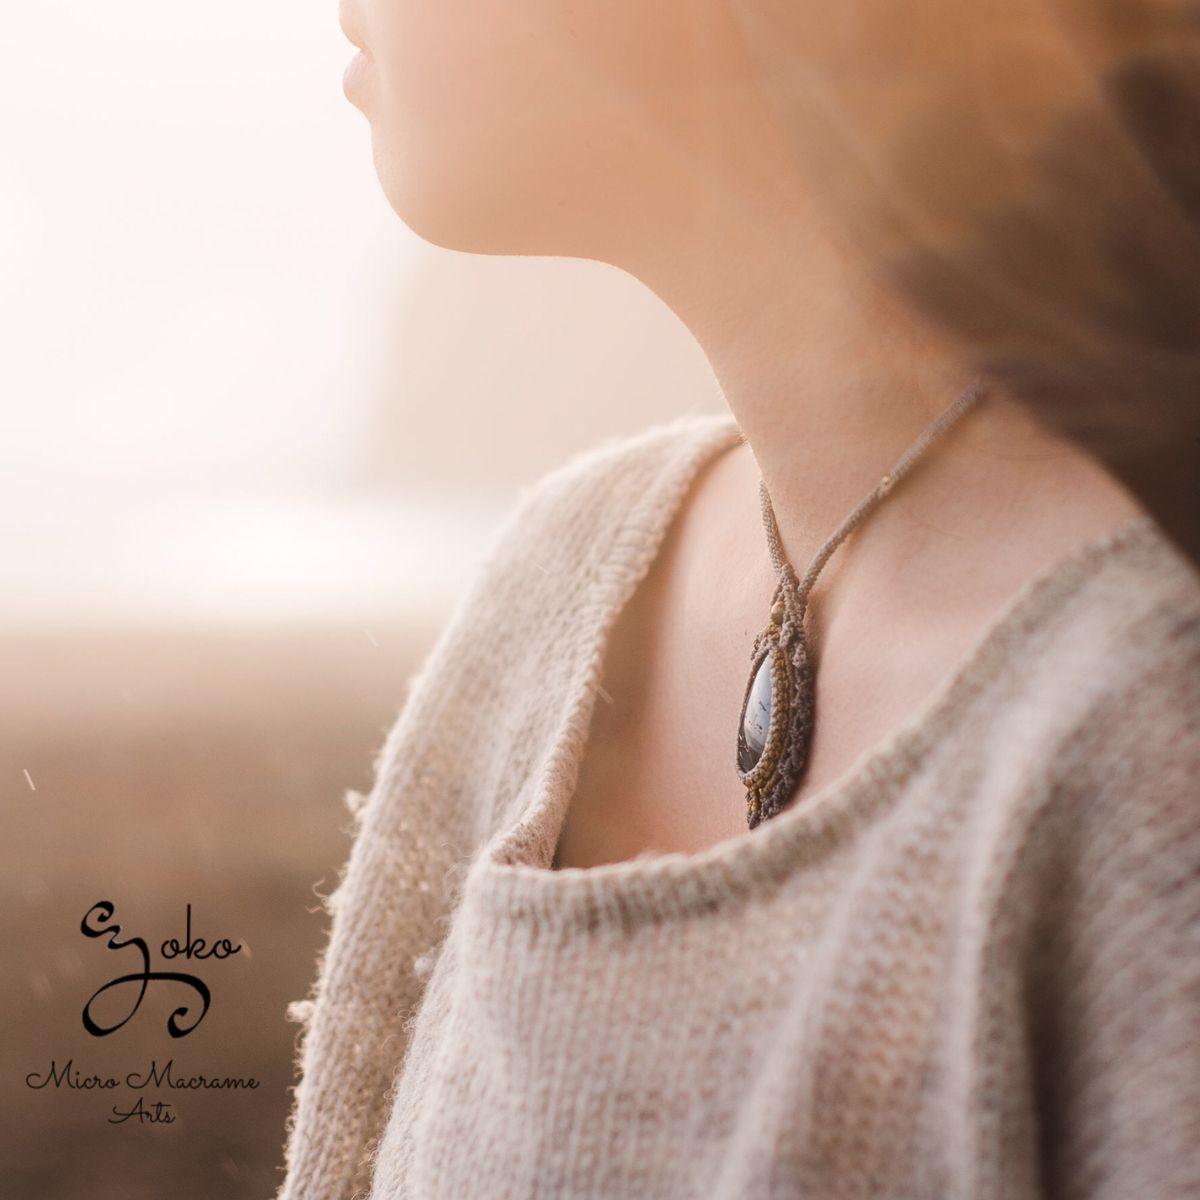 #macramejewelry #micromacrame #labradorite #crystal #necklace #jewelry #art #photography #マクラメ #ネックレス #ラブラドライト #天然石